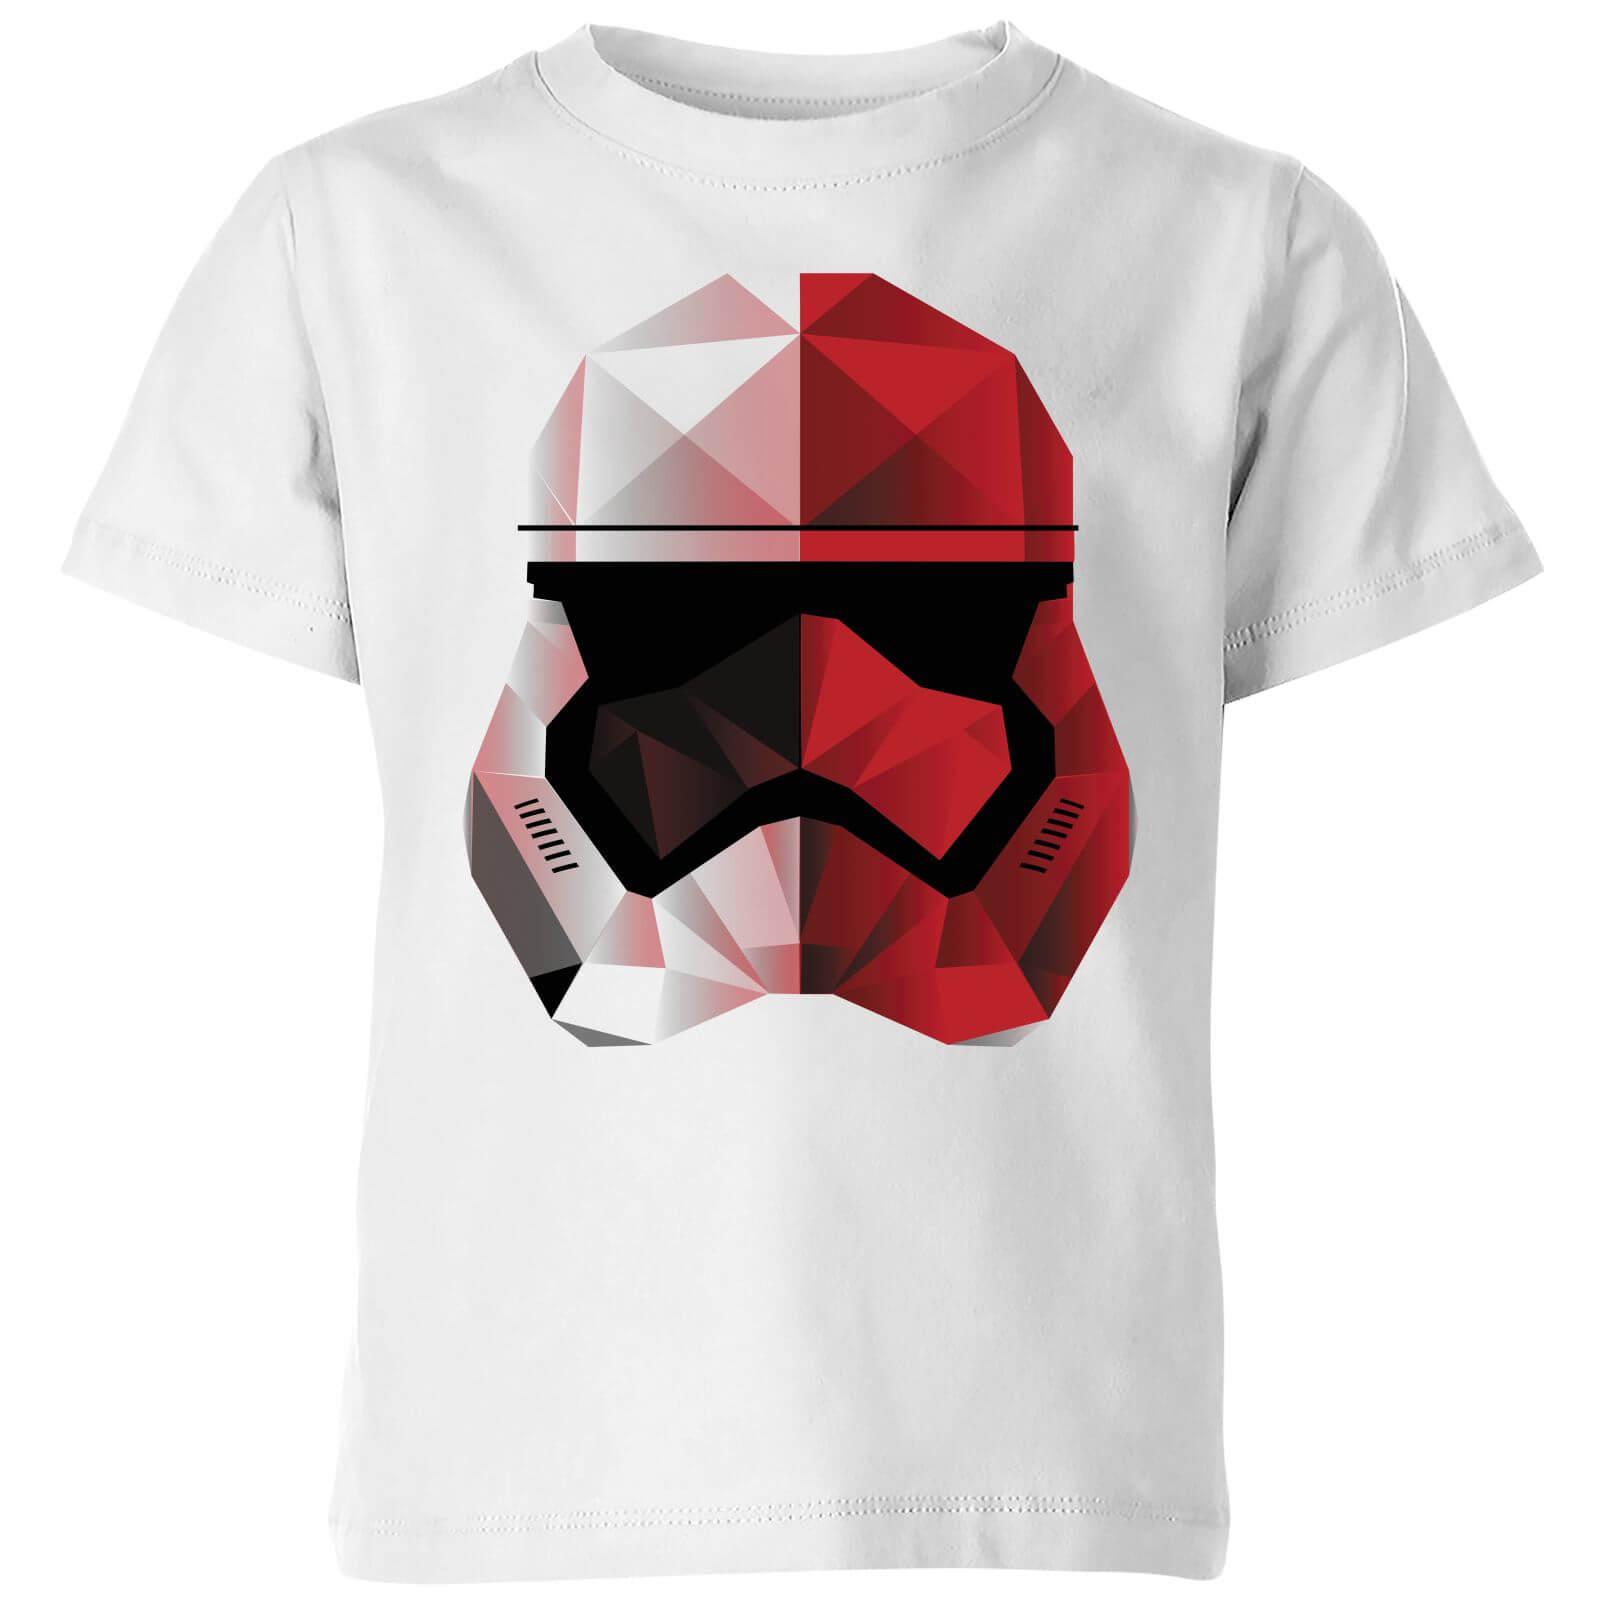 Star Wars T-Shirt Enfant Casque Stormtrooper Effet Cubiste - Star Wars - Blanc - 9-10 ans - Blanc